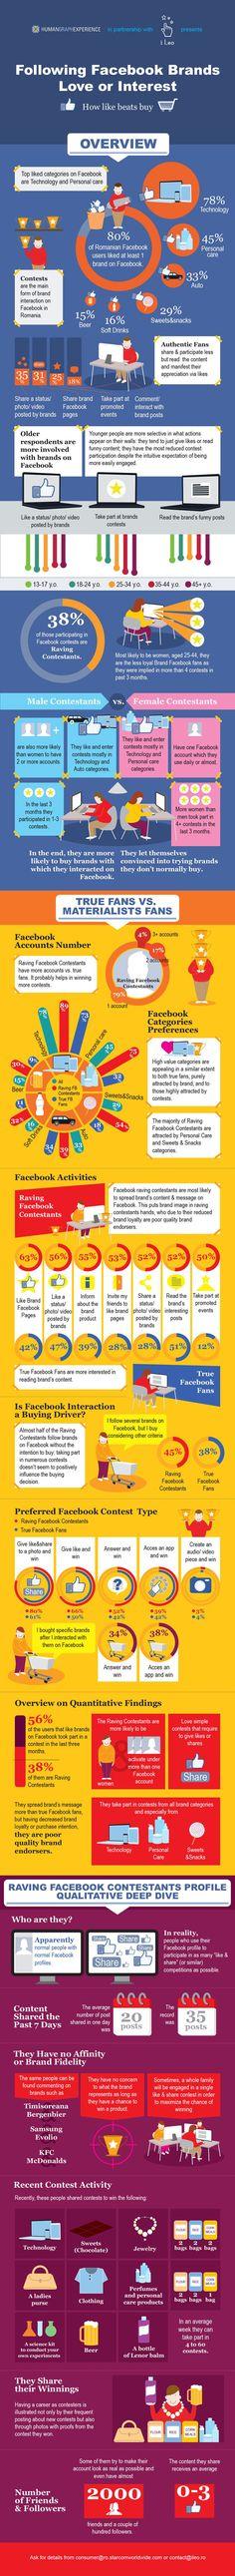 Following #Facebook Brands: Love or Interest? #Infographic  #socialmedia